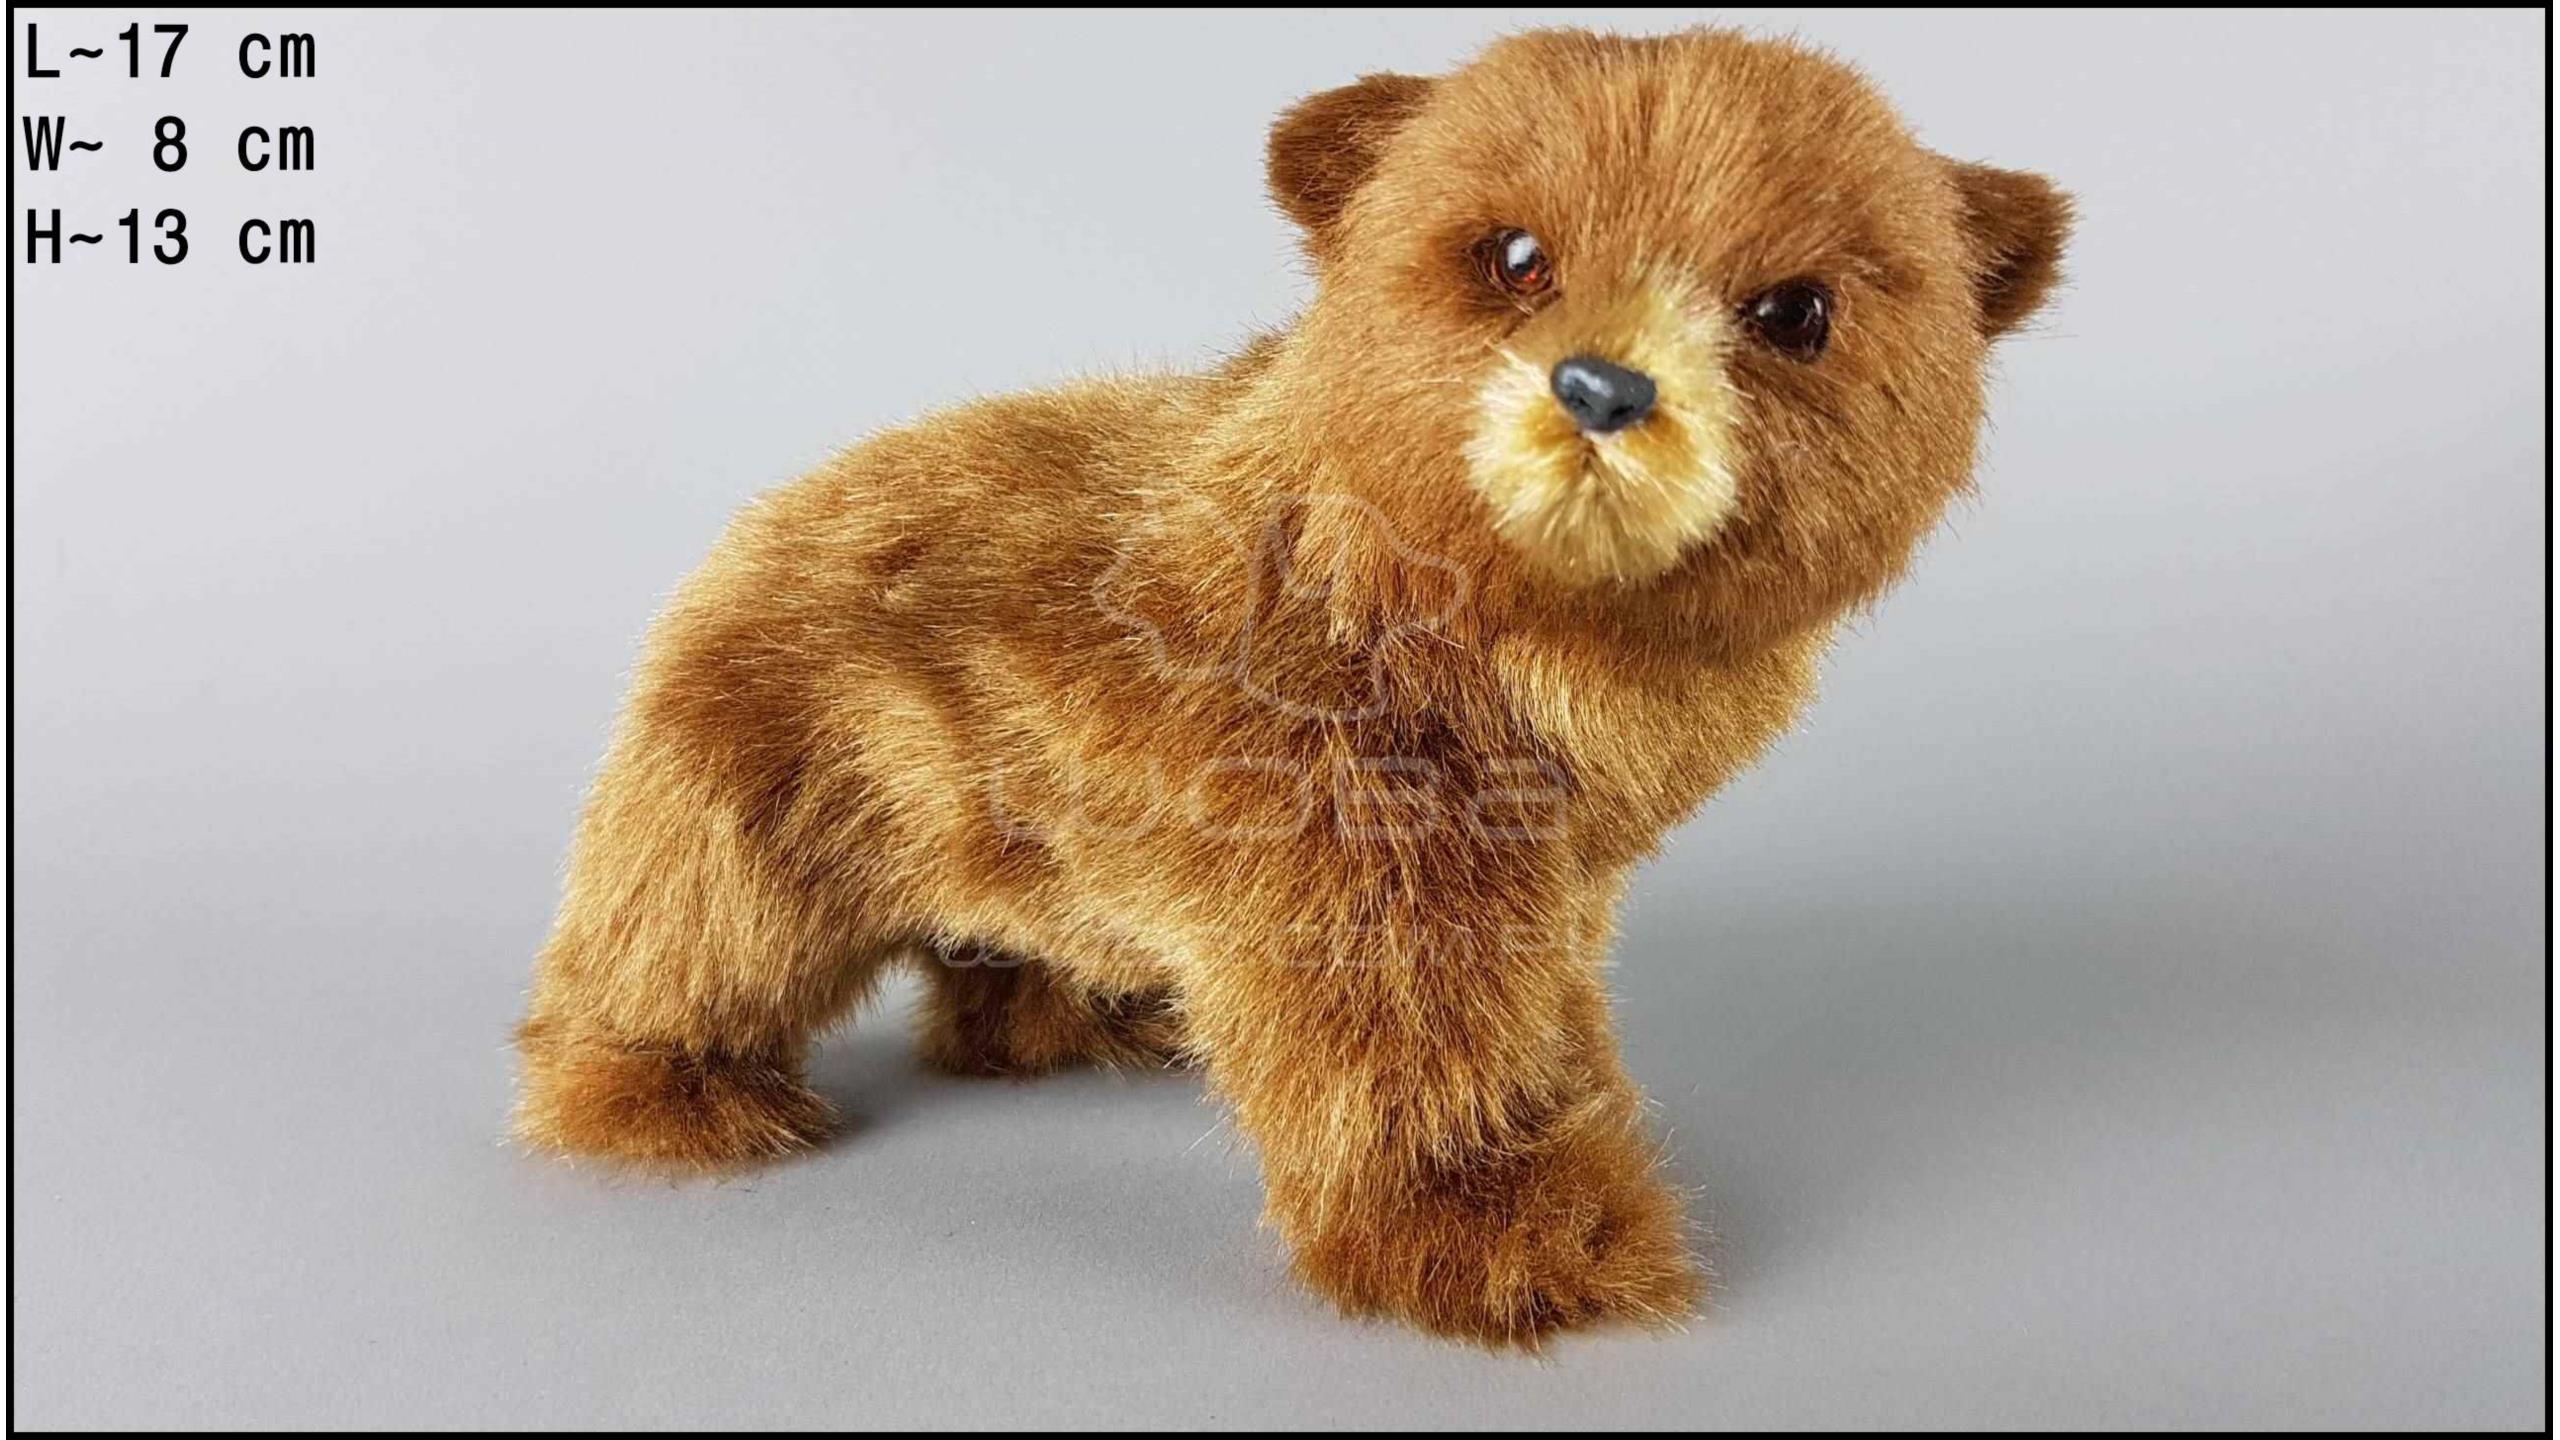 Brown bear - Standing